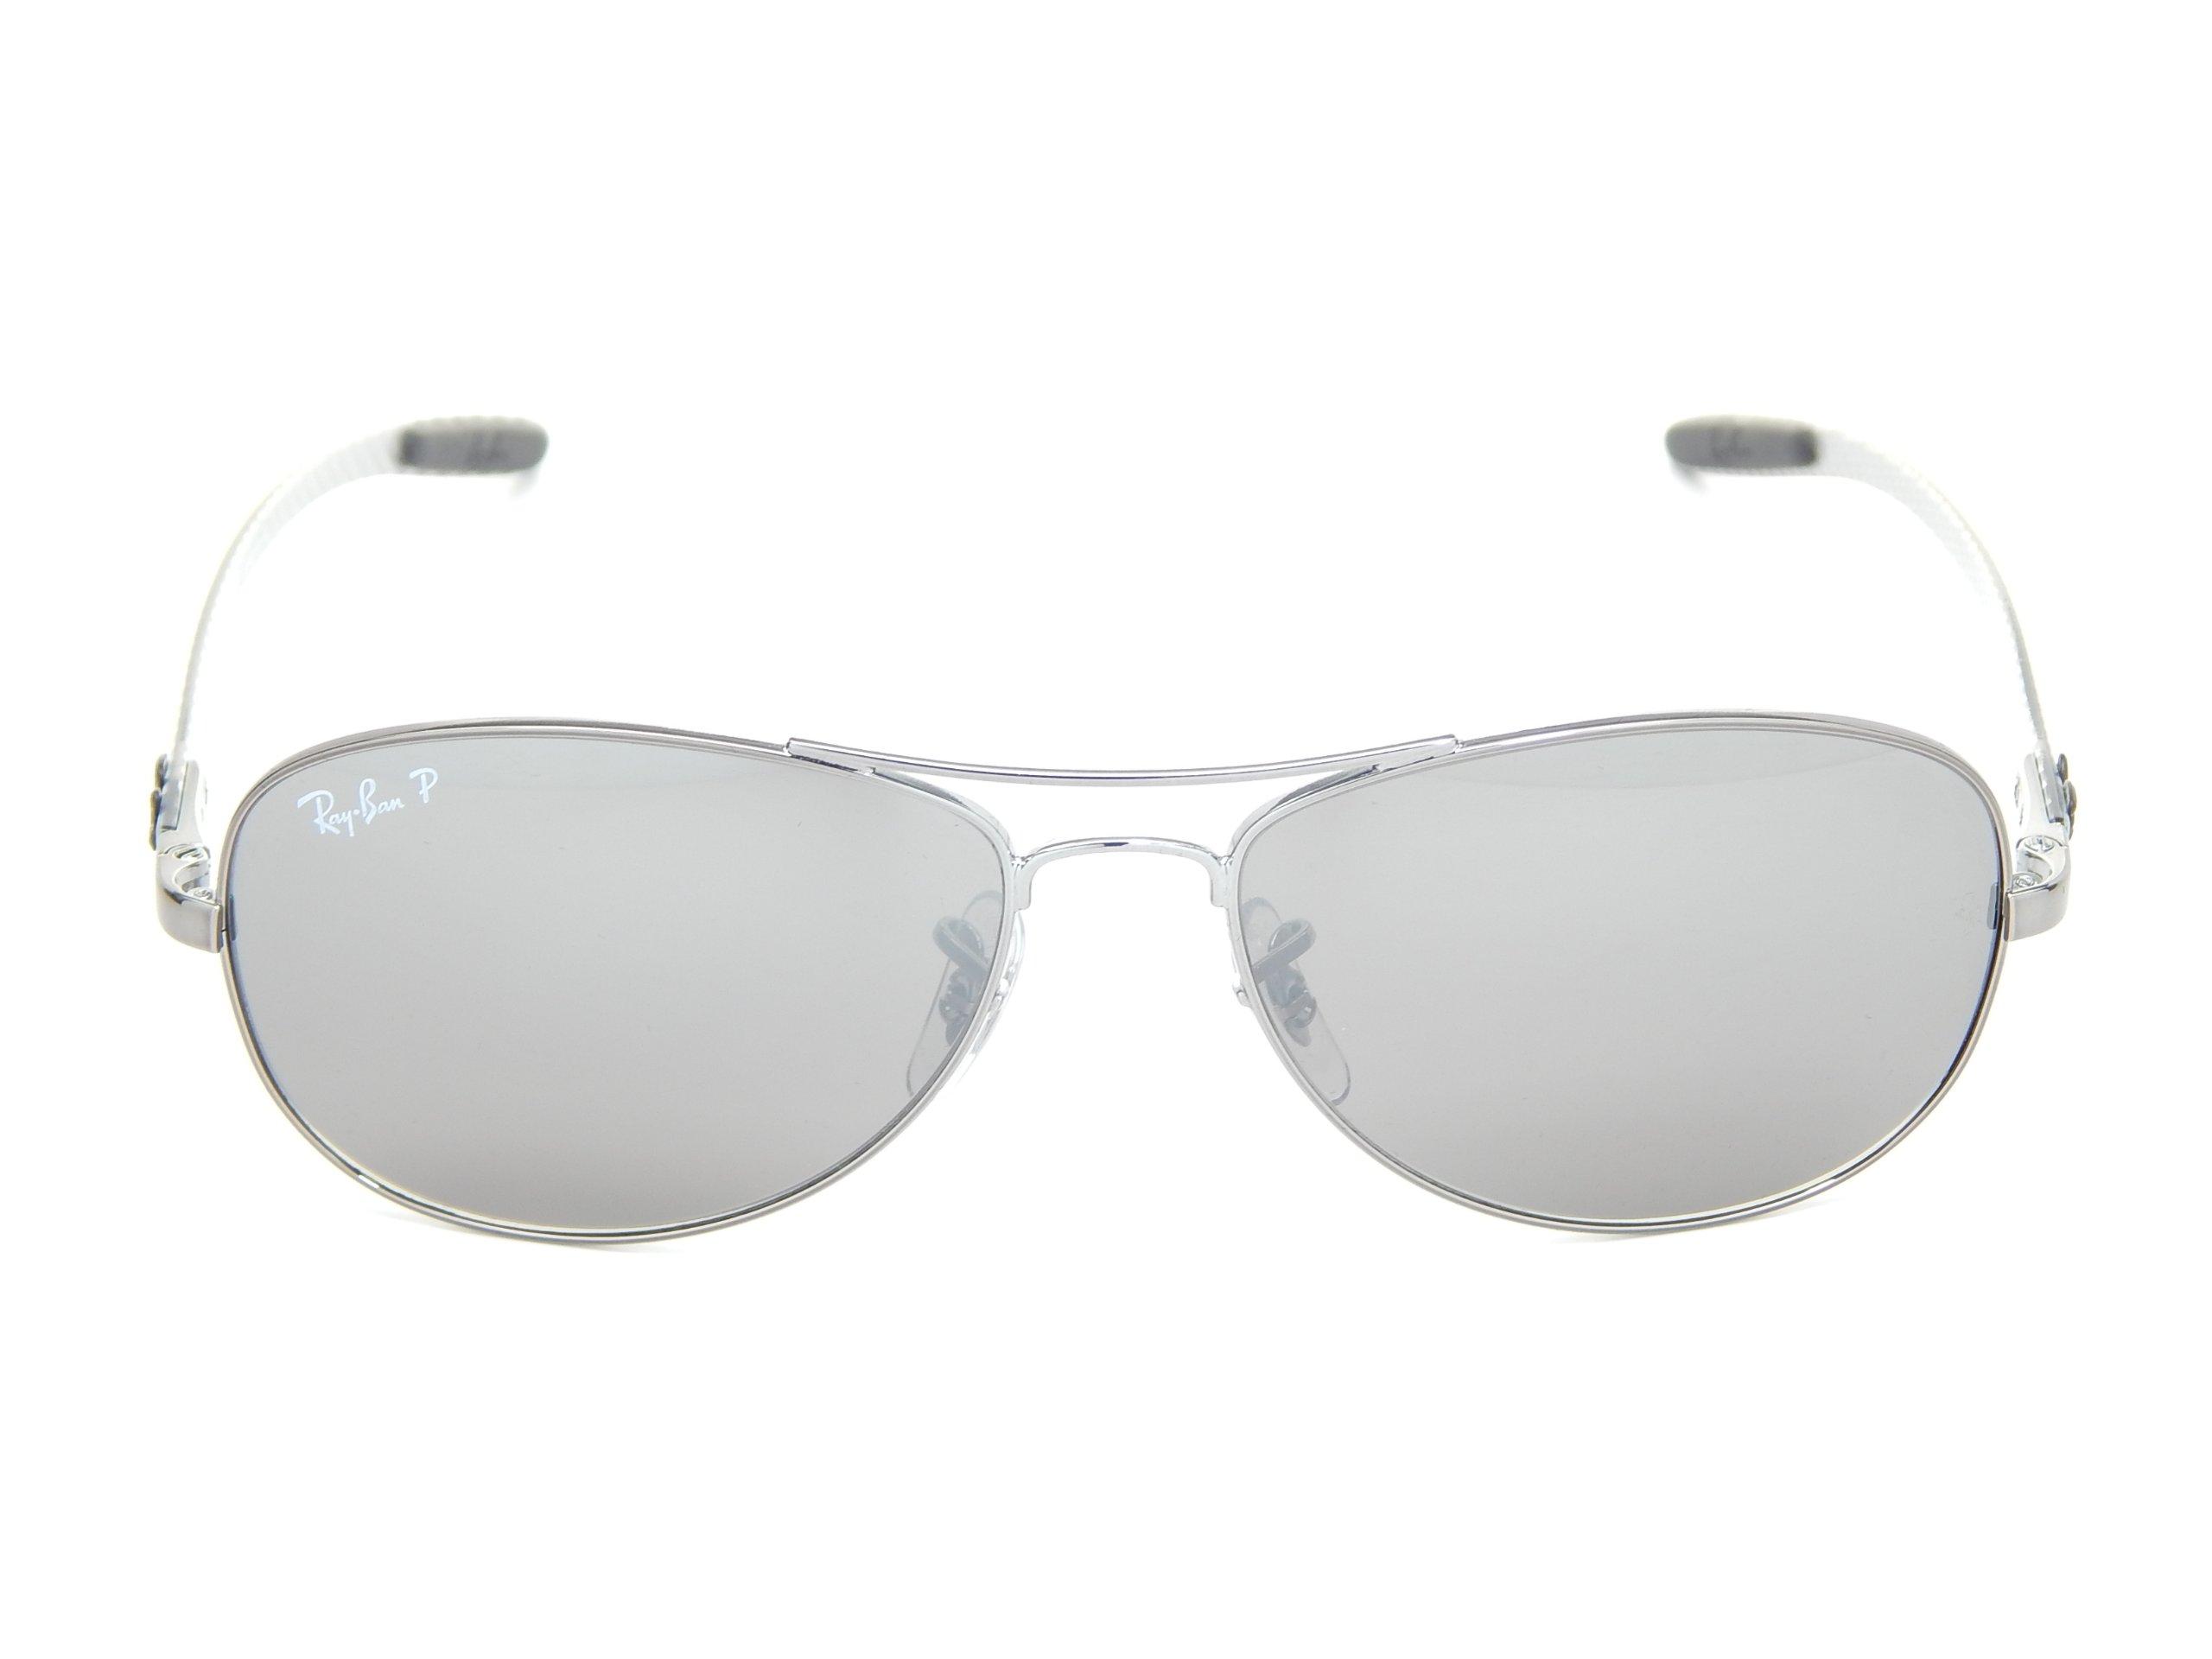 565e3458448 New Ray Ban RB8301 004 N8 Tech Matte Gunmetal Gray Polarized Mirror 59mm  Sunglasses Apparel